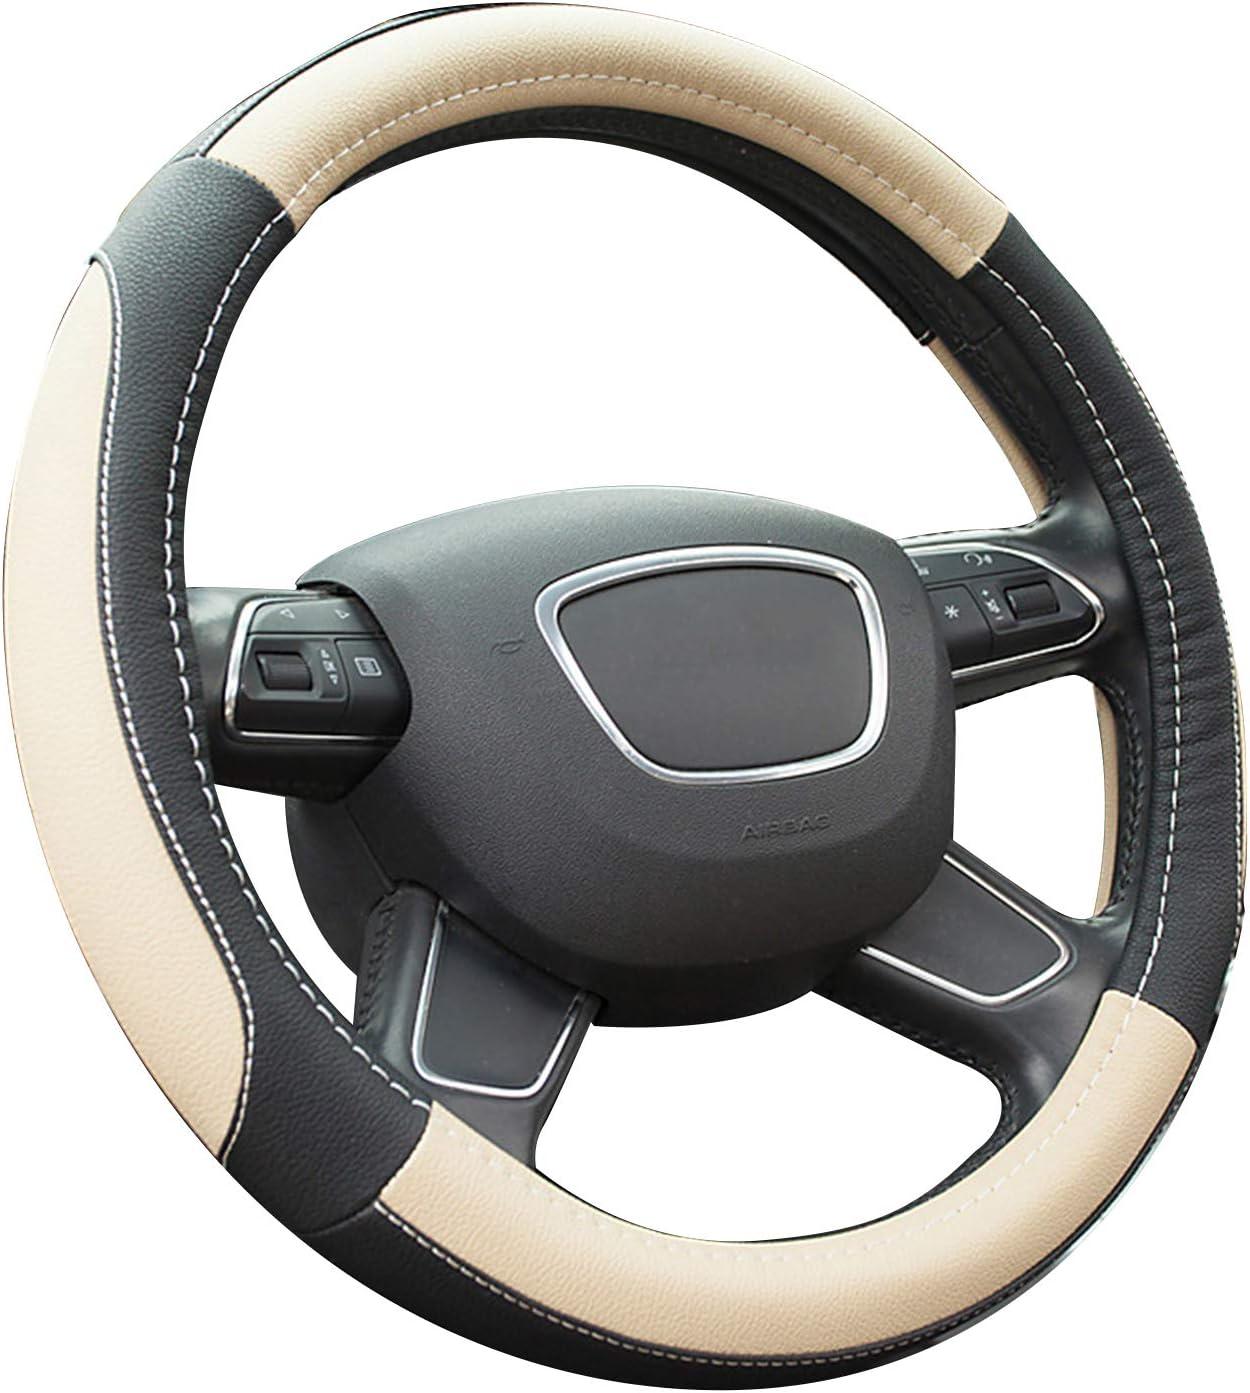 15 Anti-slip Breathable Durable SFONIA Car Steering Wheel Cover Steering Wheel Protector Microfiber Leather Universal 38cm White